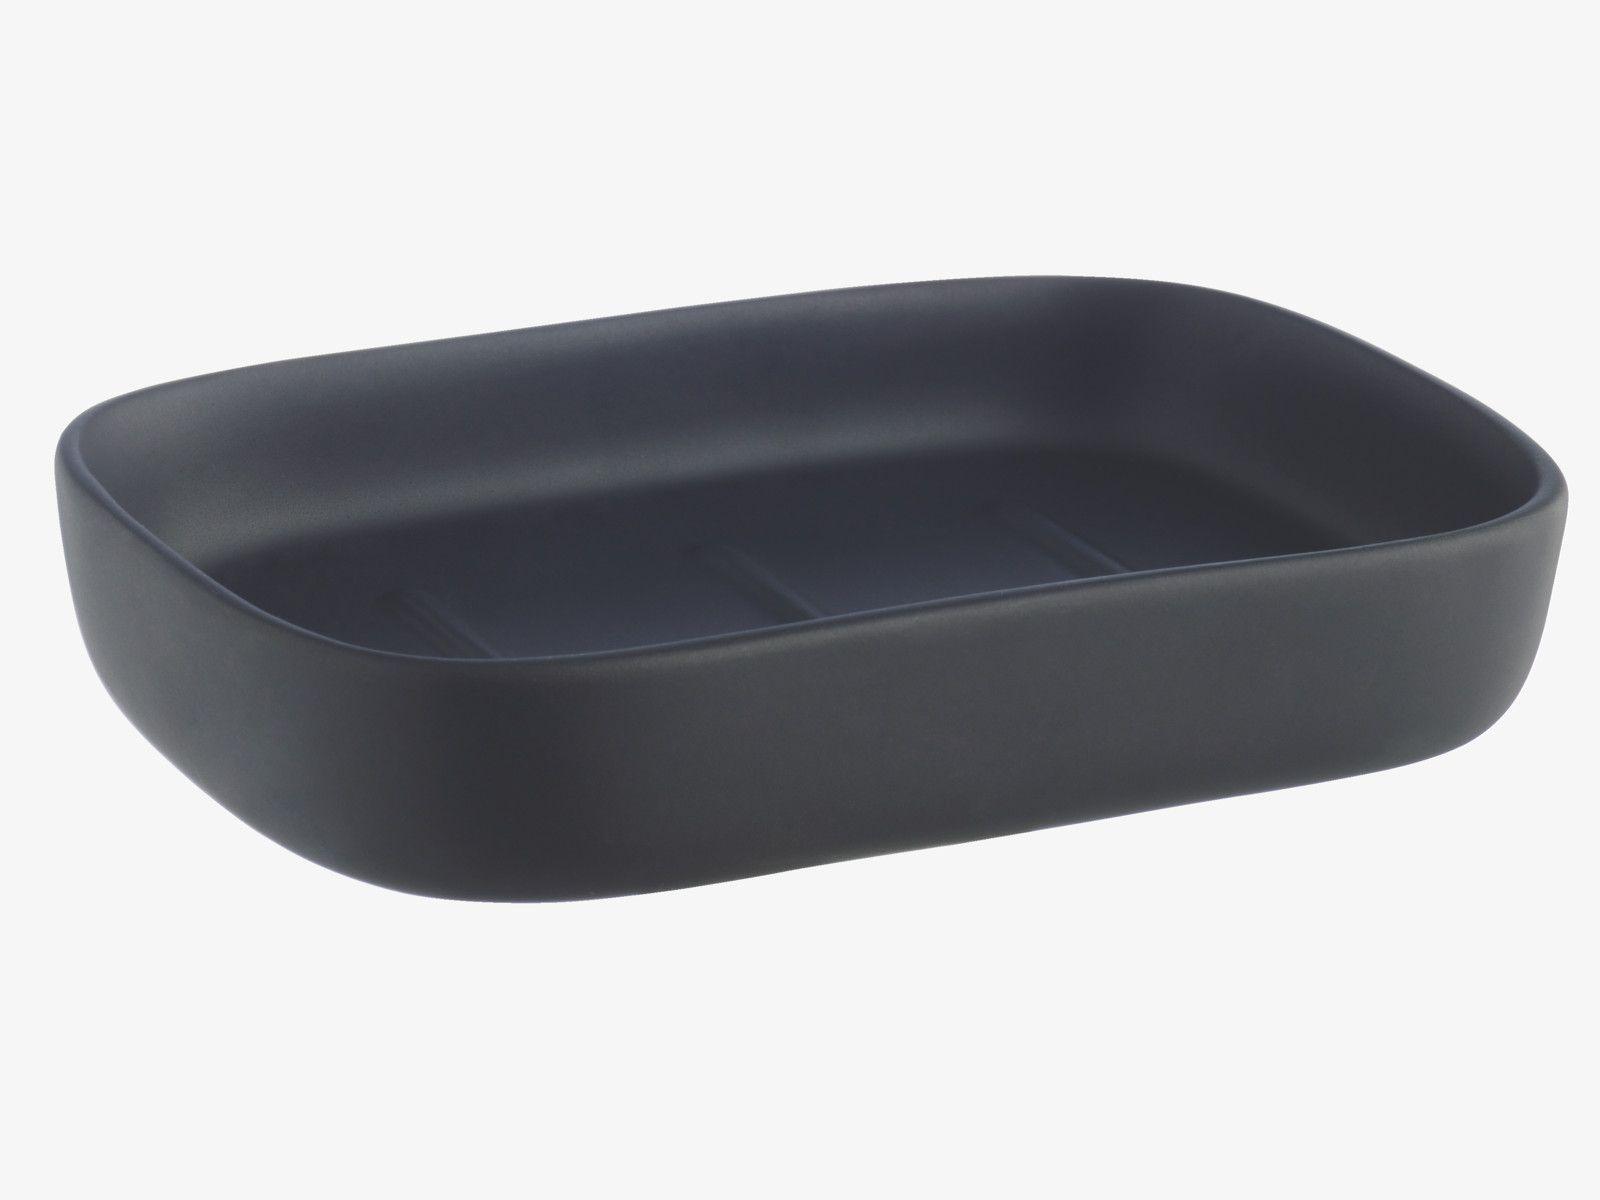 Nomo Blacks Stone Black Dolomite Soap Dish Habitatuk